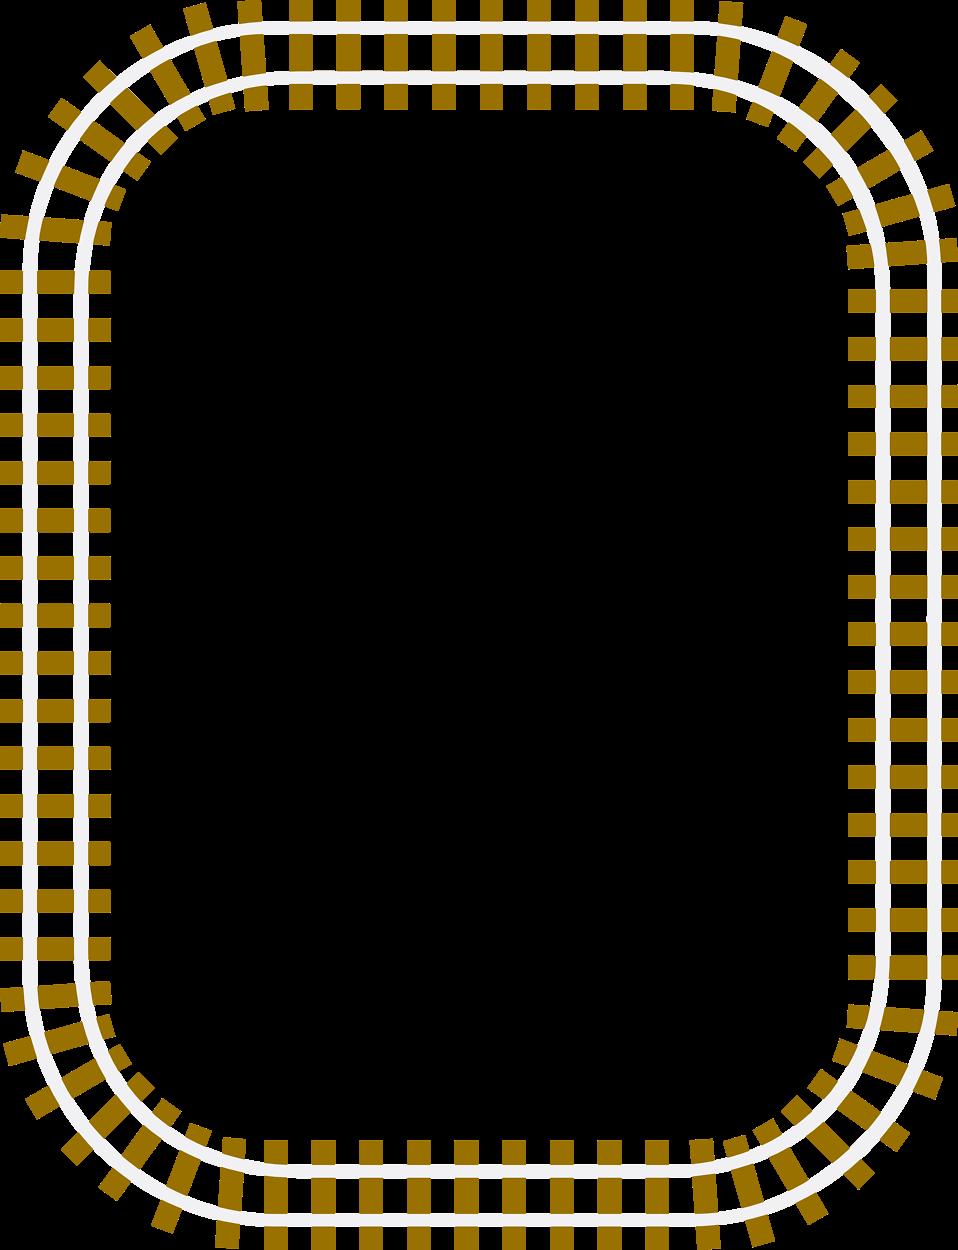 Free Train Borders Clipart.